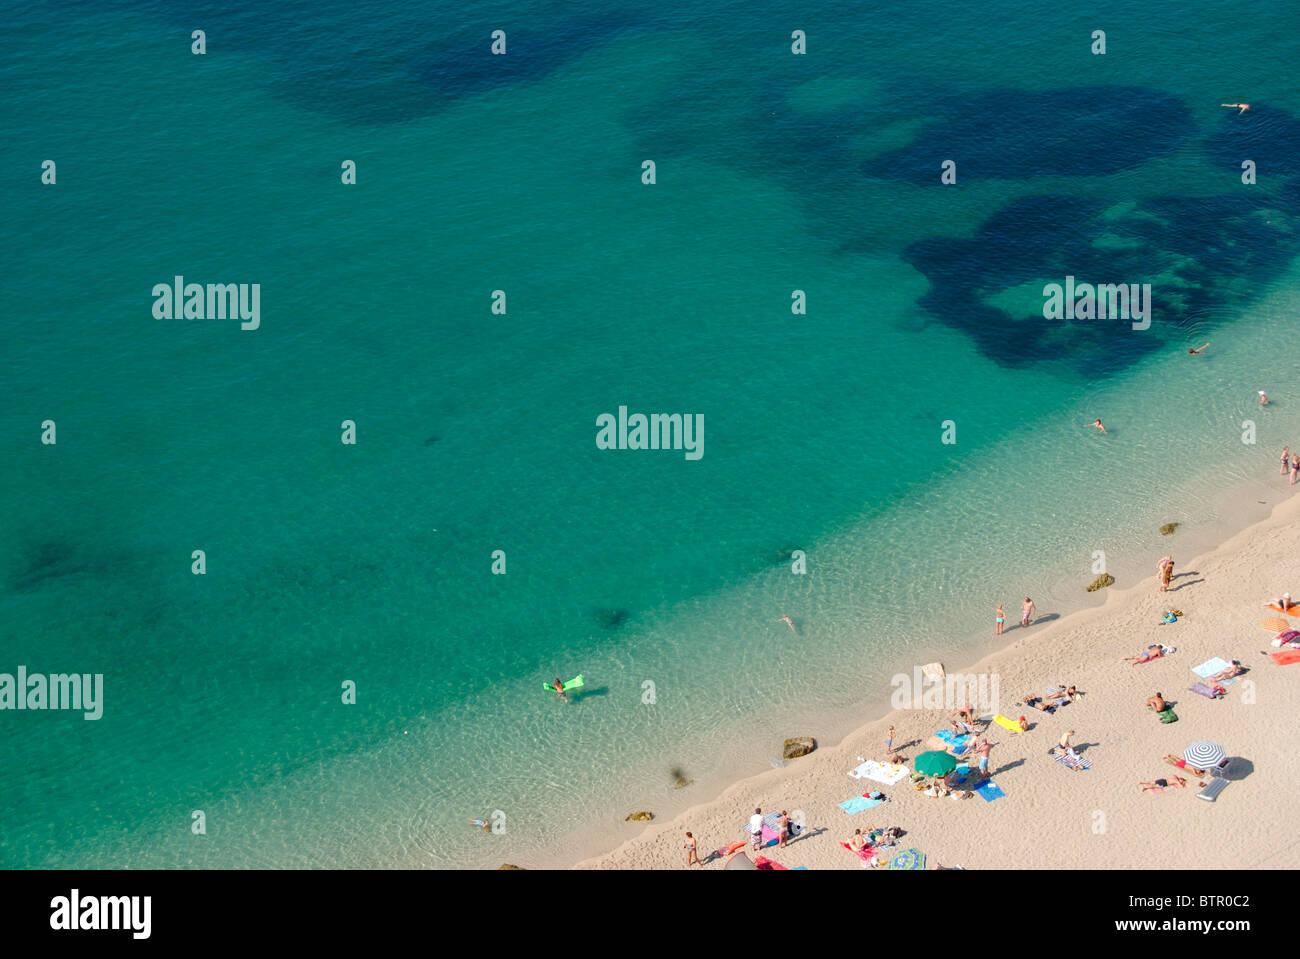 Frankreich, Villefranche-Sur-Mer, Blick über den Strand Stockfoto